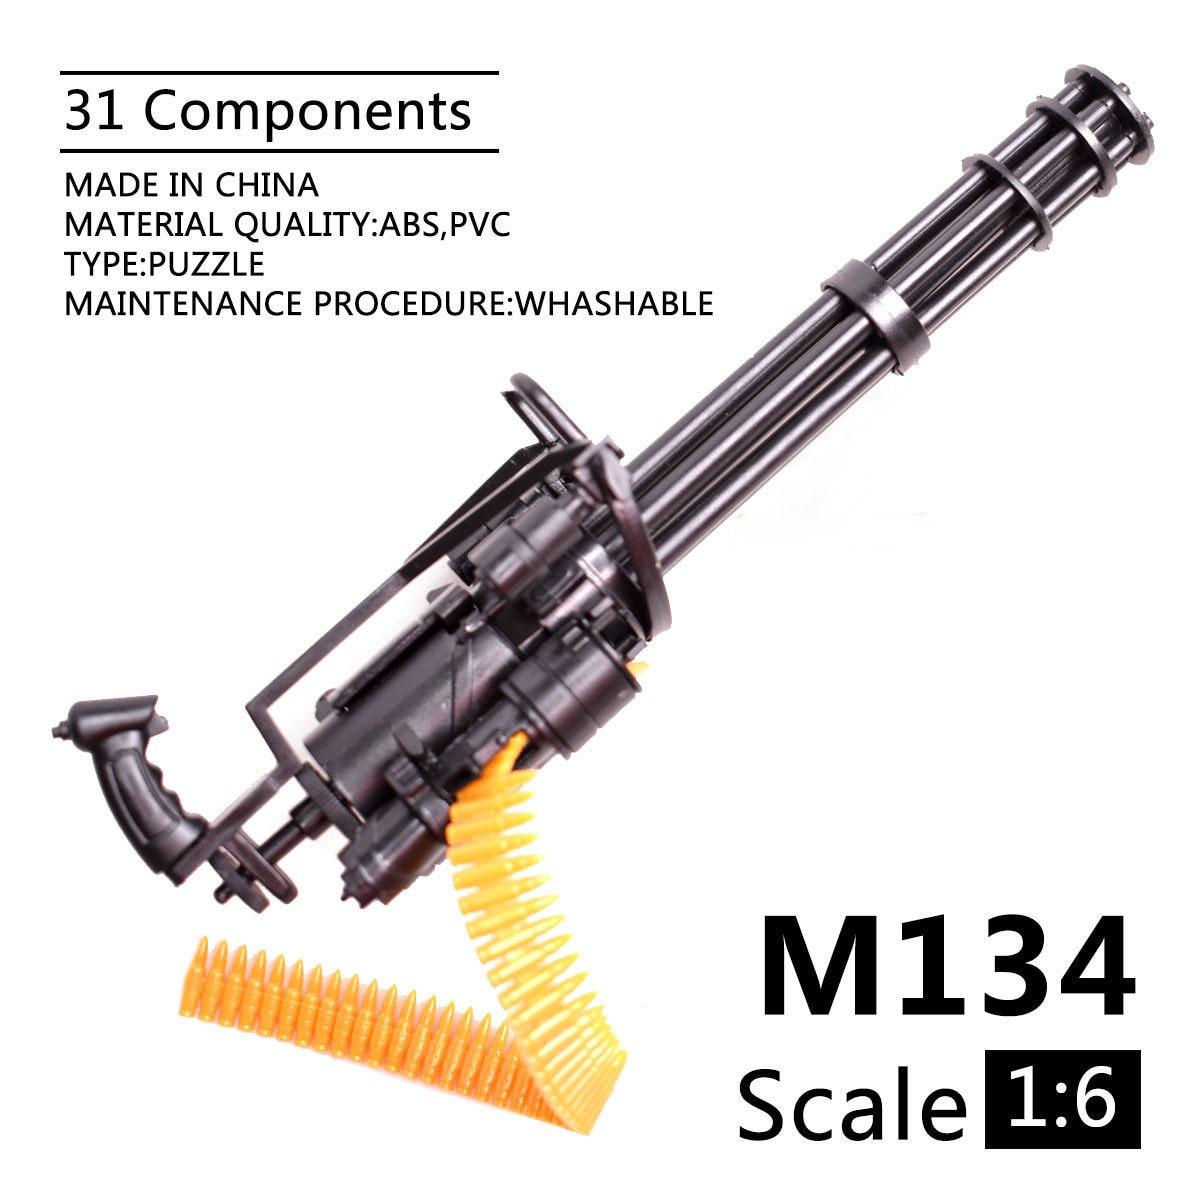 Gatling 4D Assembly Toy Gun, 1:6 Toy Gun,1/6 M134 Minigun Gatling Toy Gun